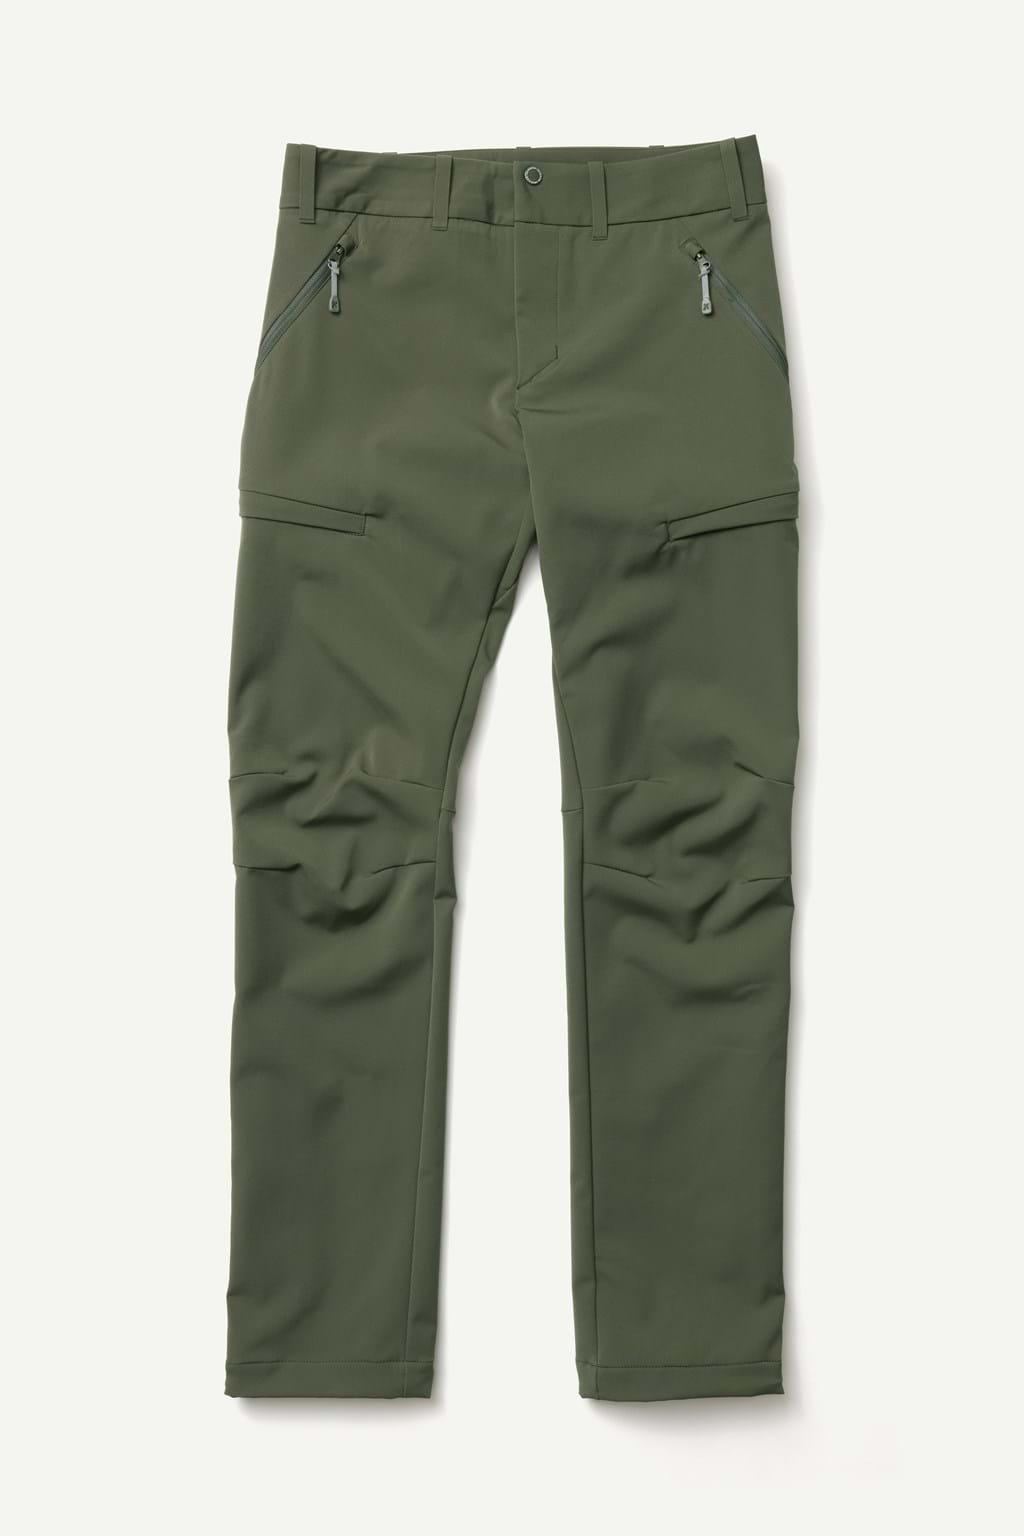 HOUDINI Motion Top Pants